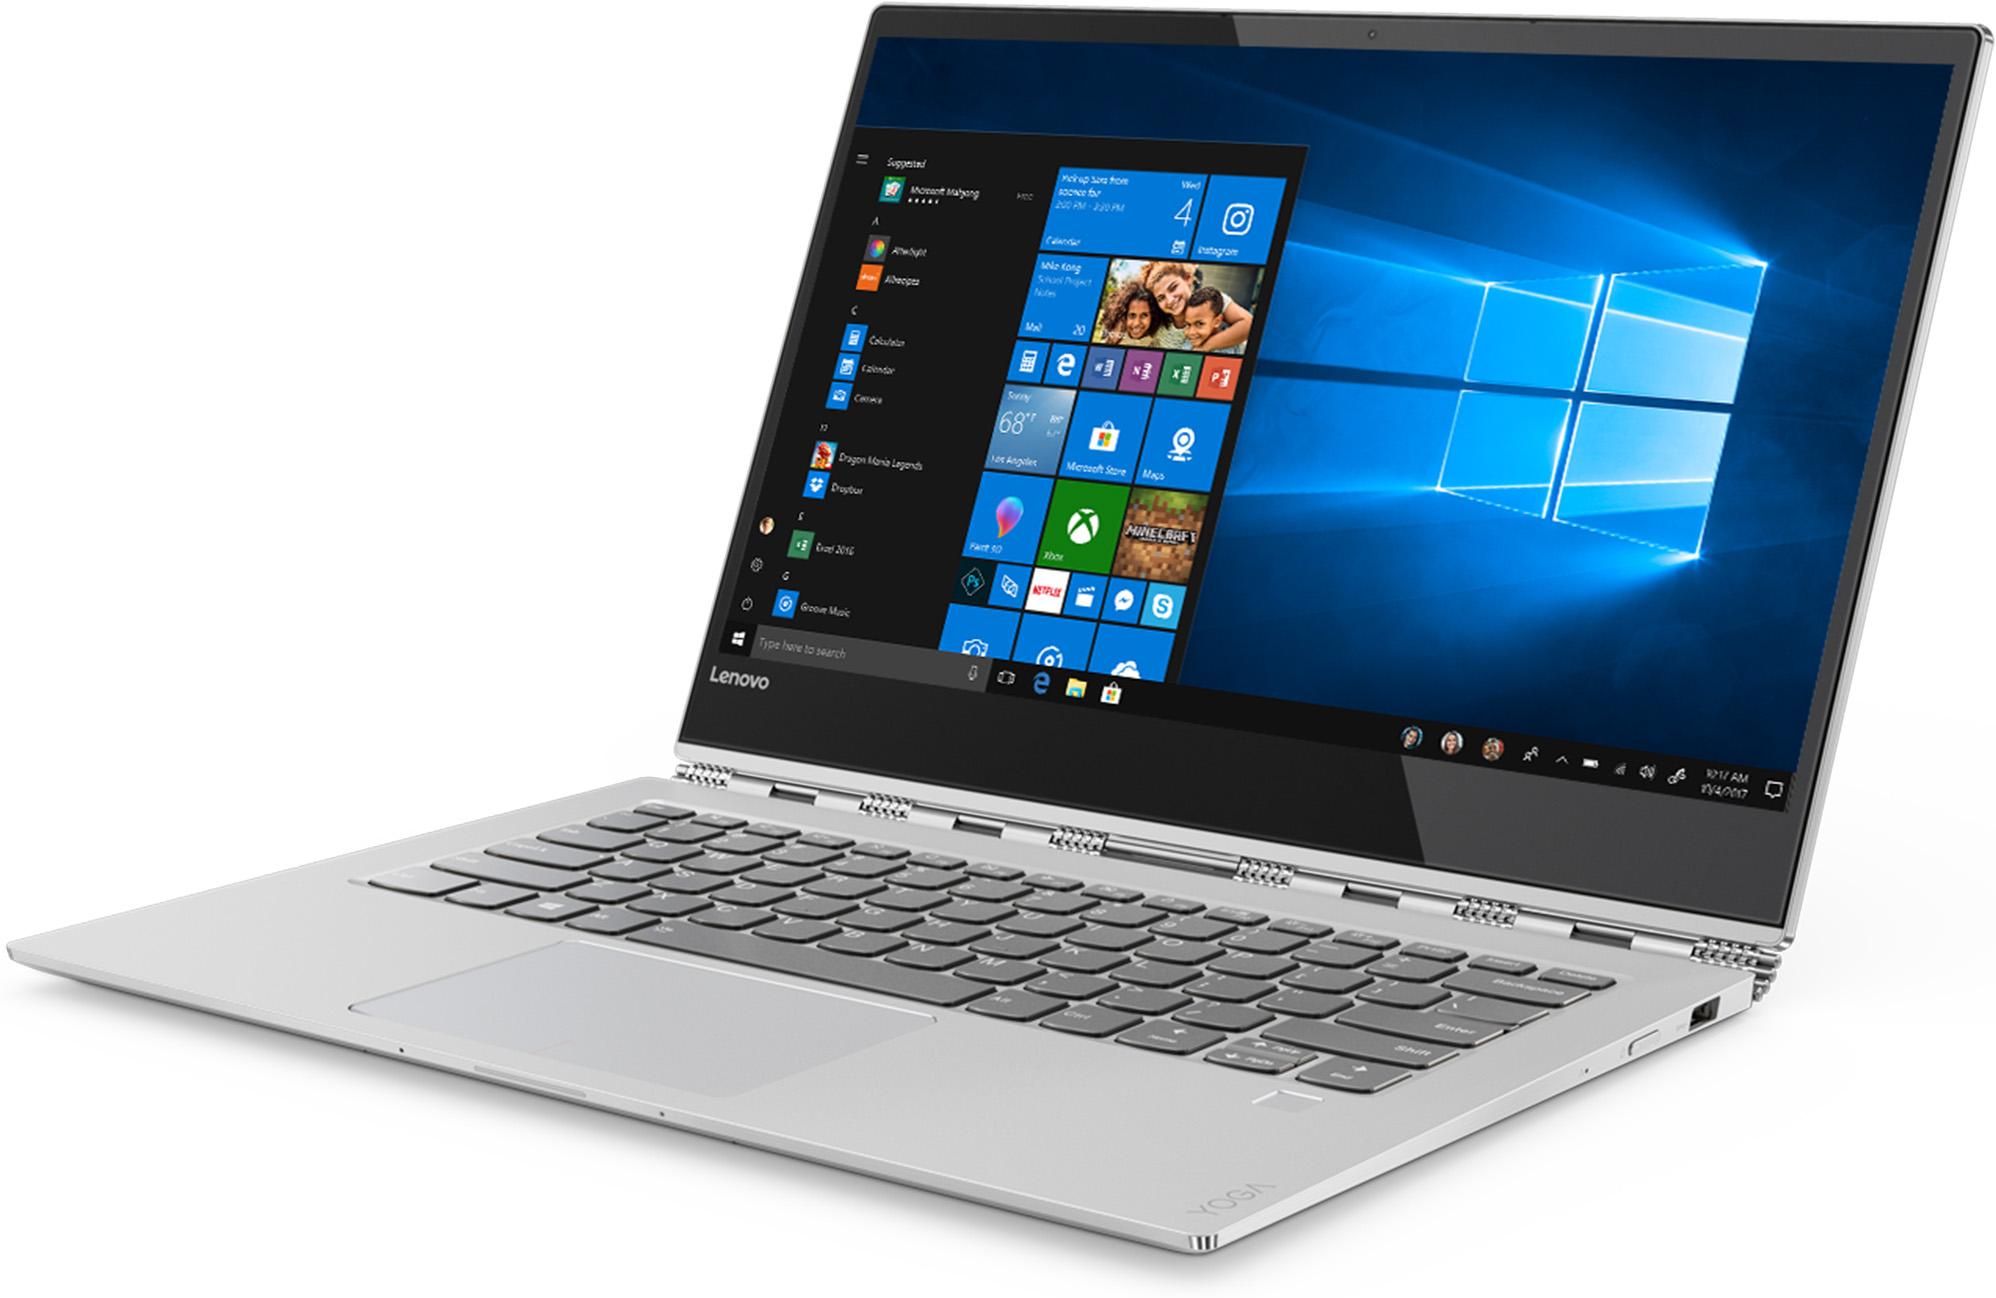 "Lenovo Yoga 920, 13.9"" FHD, I5 8G, 256G SSD"